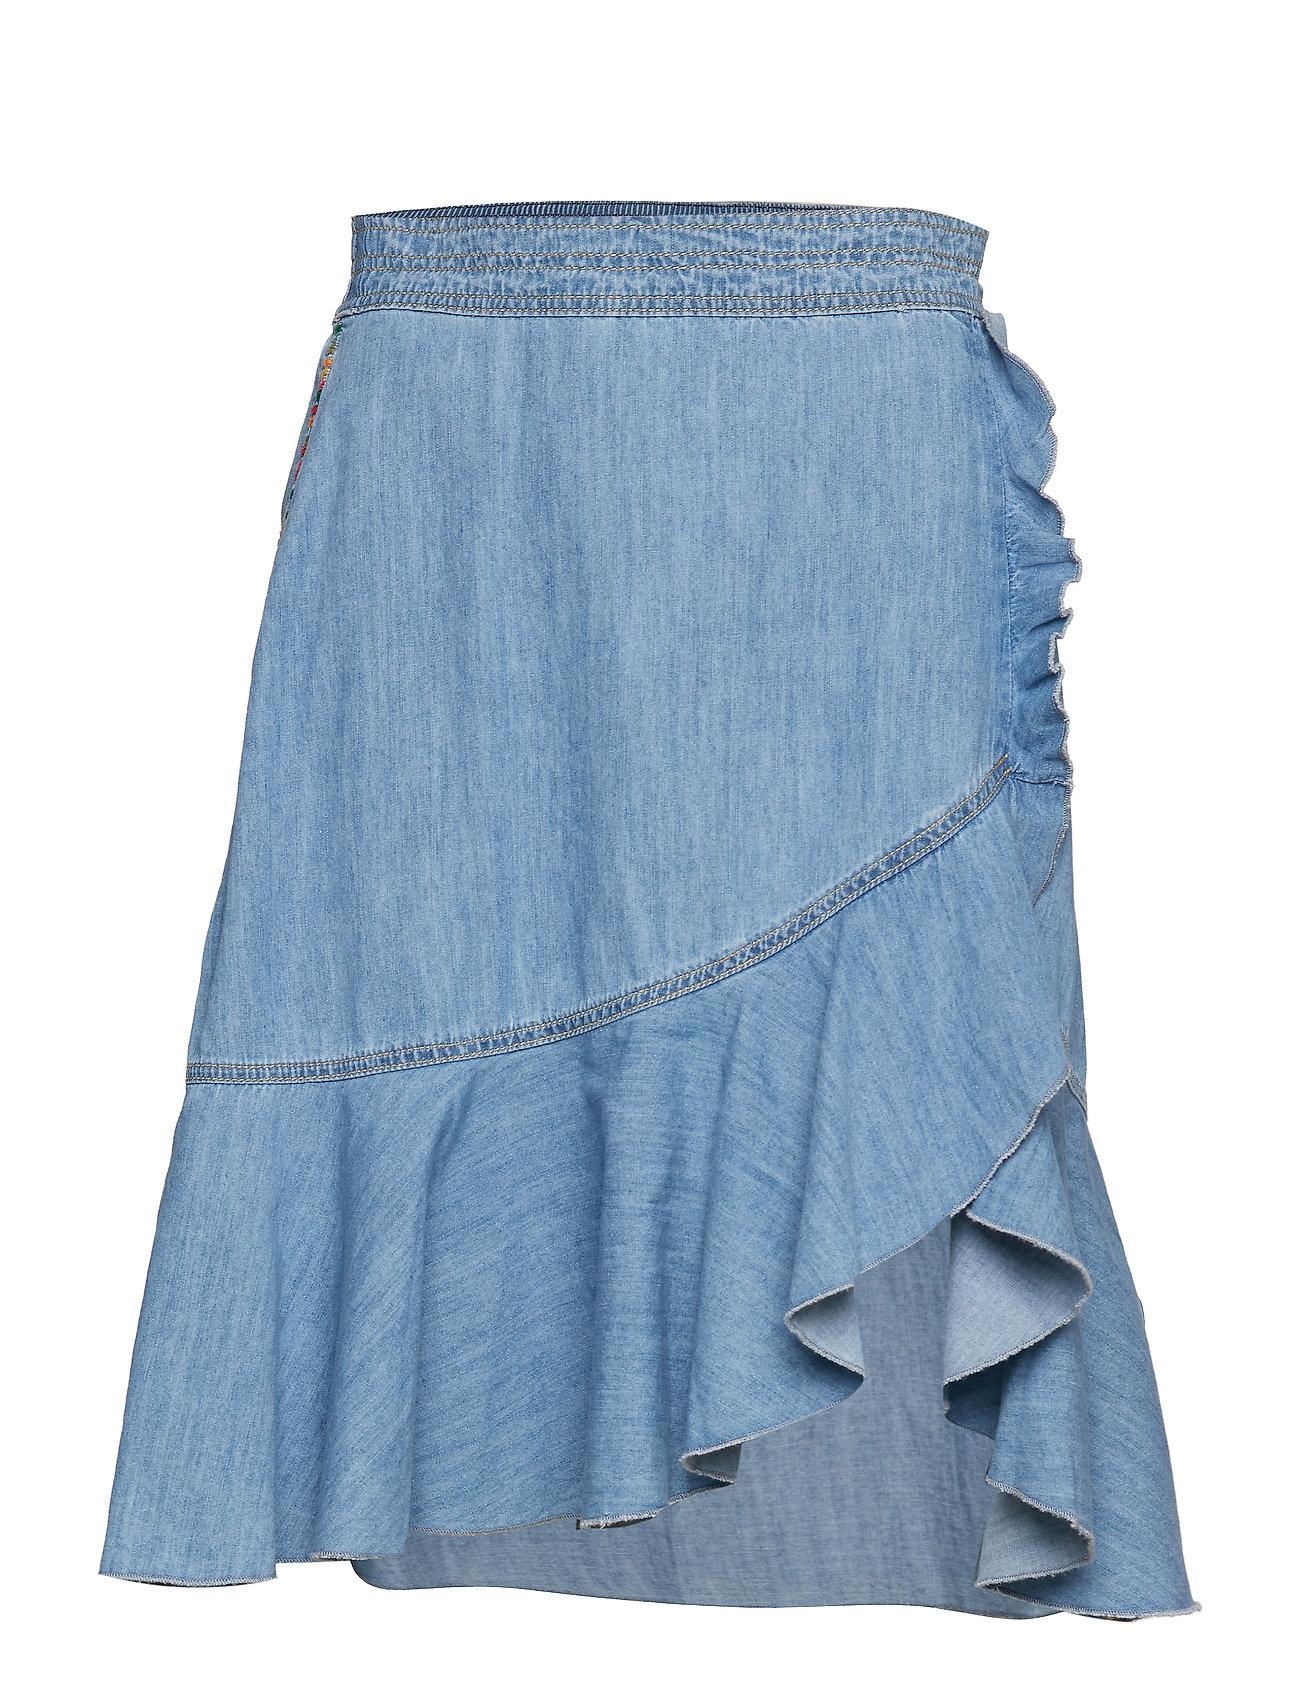 ODD MOLLY so me skirt - DENIM CHAMBRAY